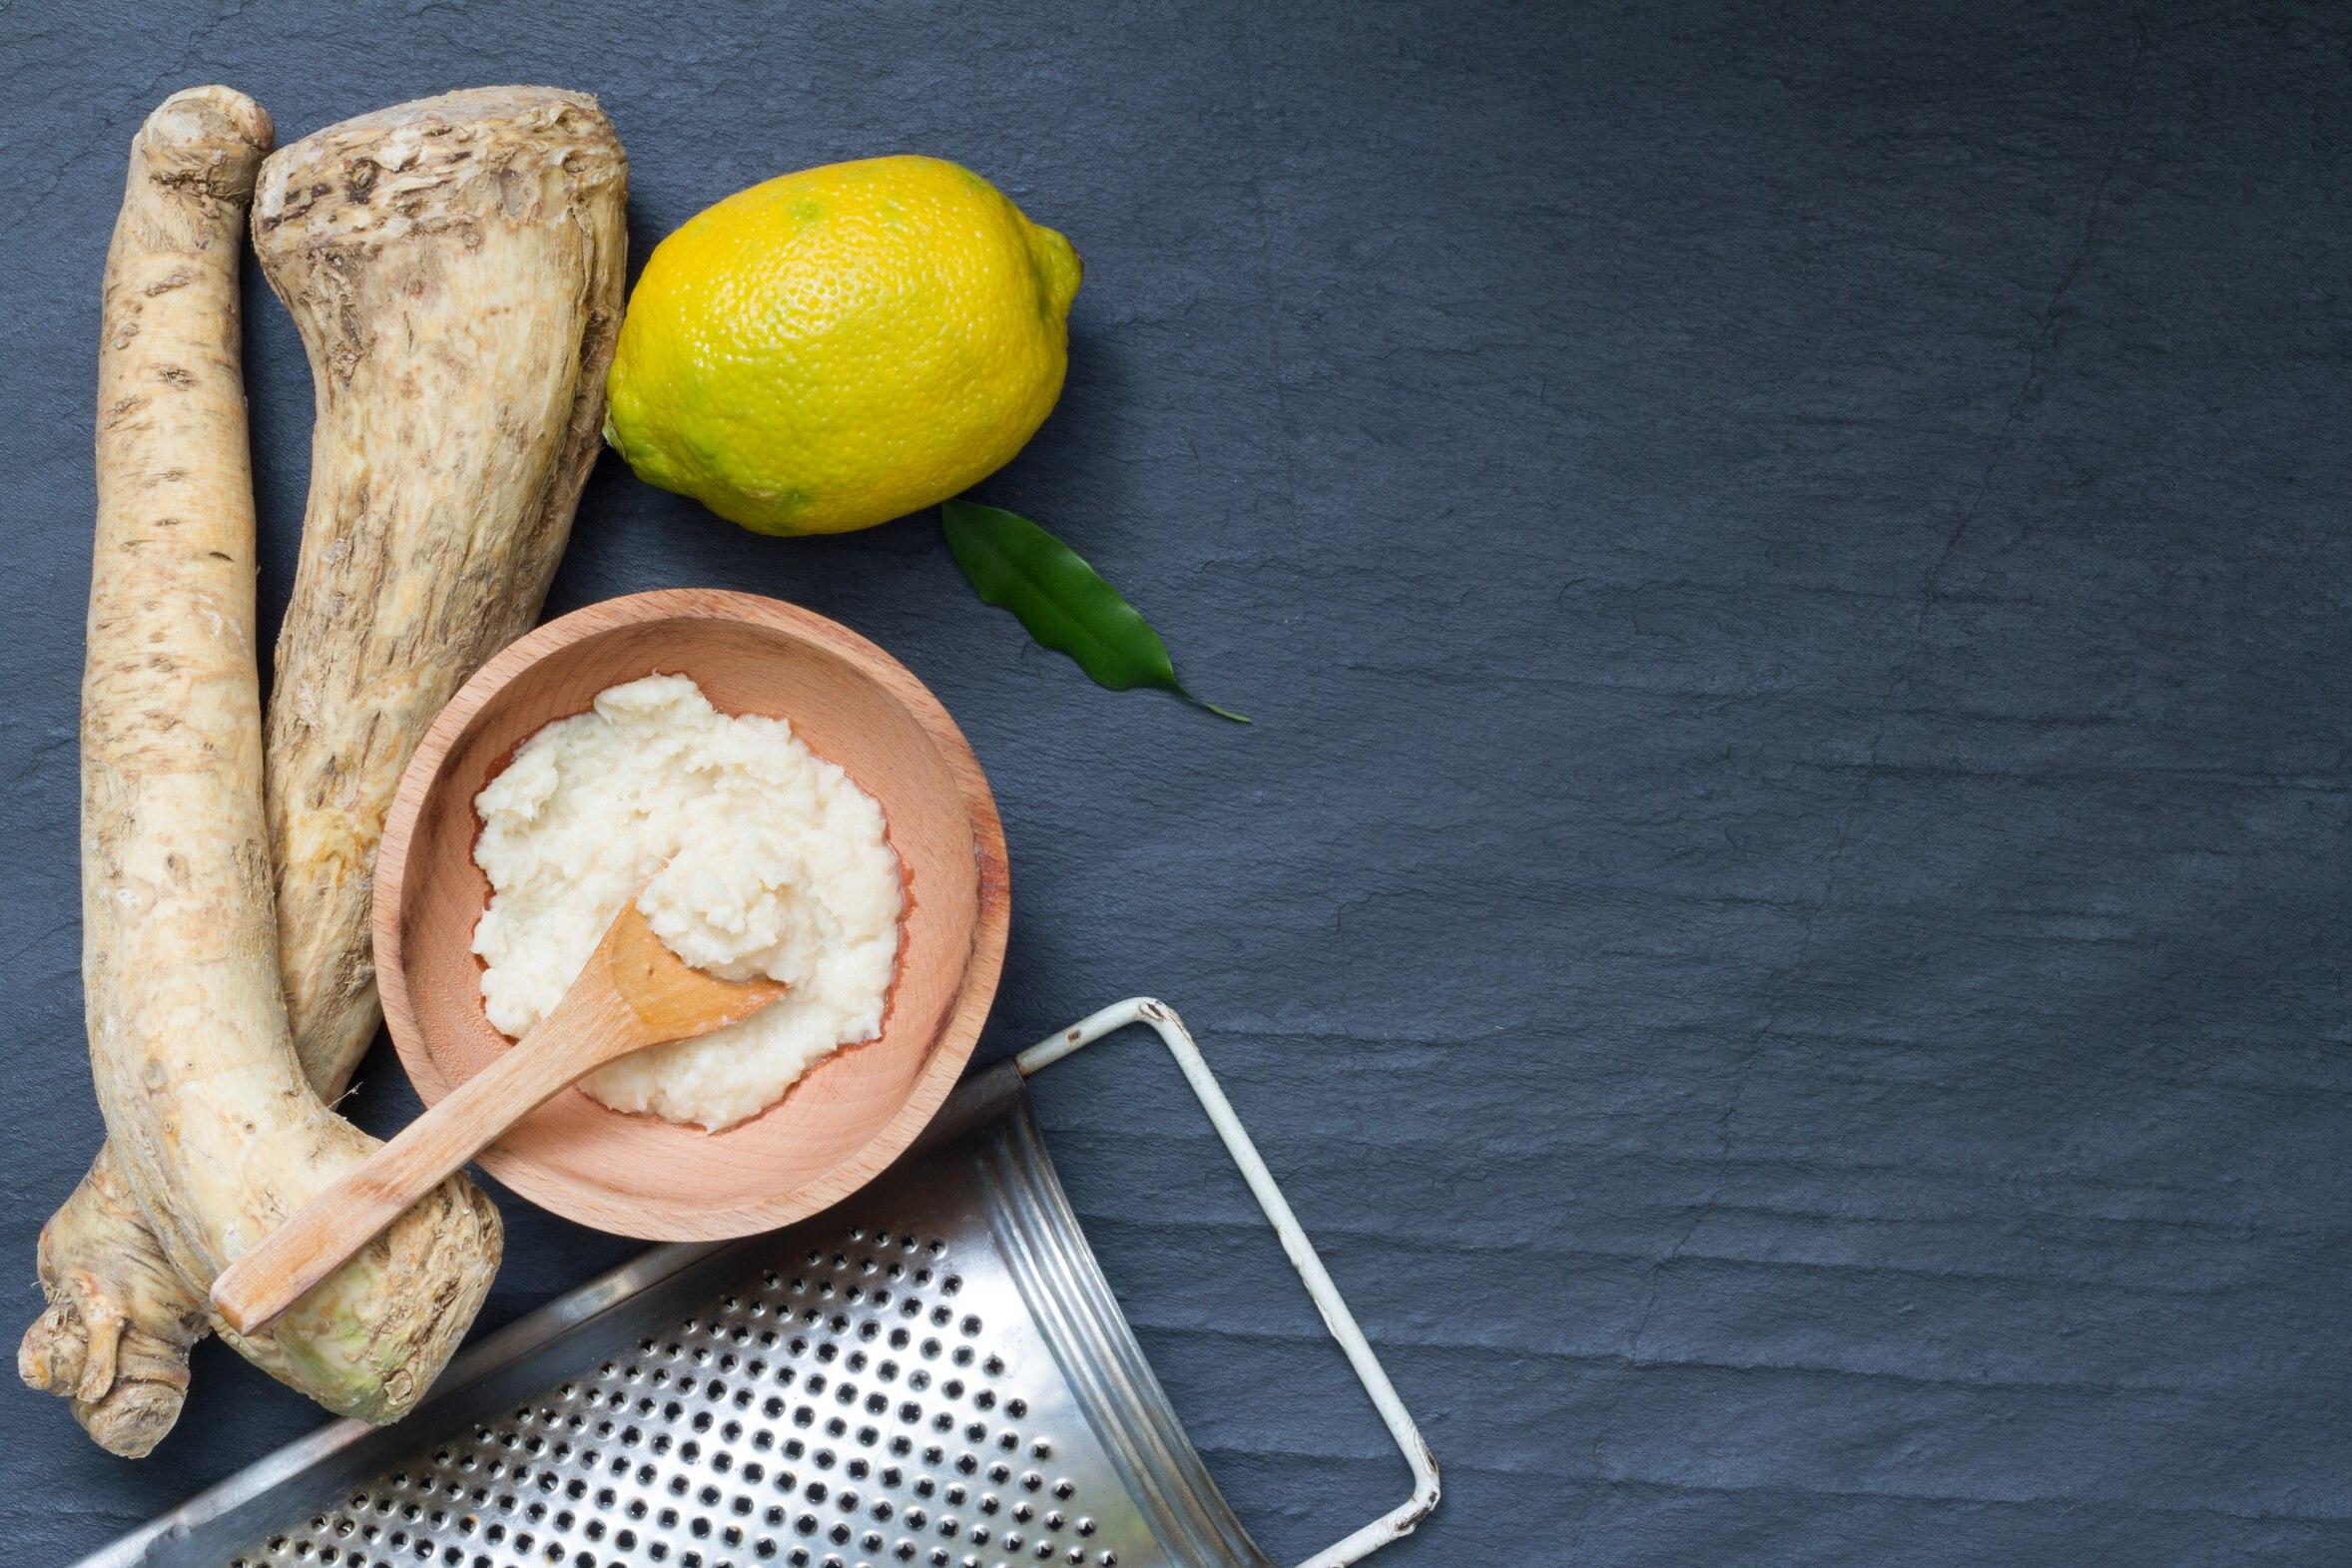 Meerrettich hat doppelt so viel Vitamin C wie Zitronen